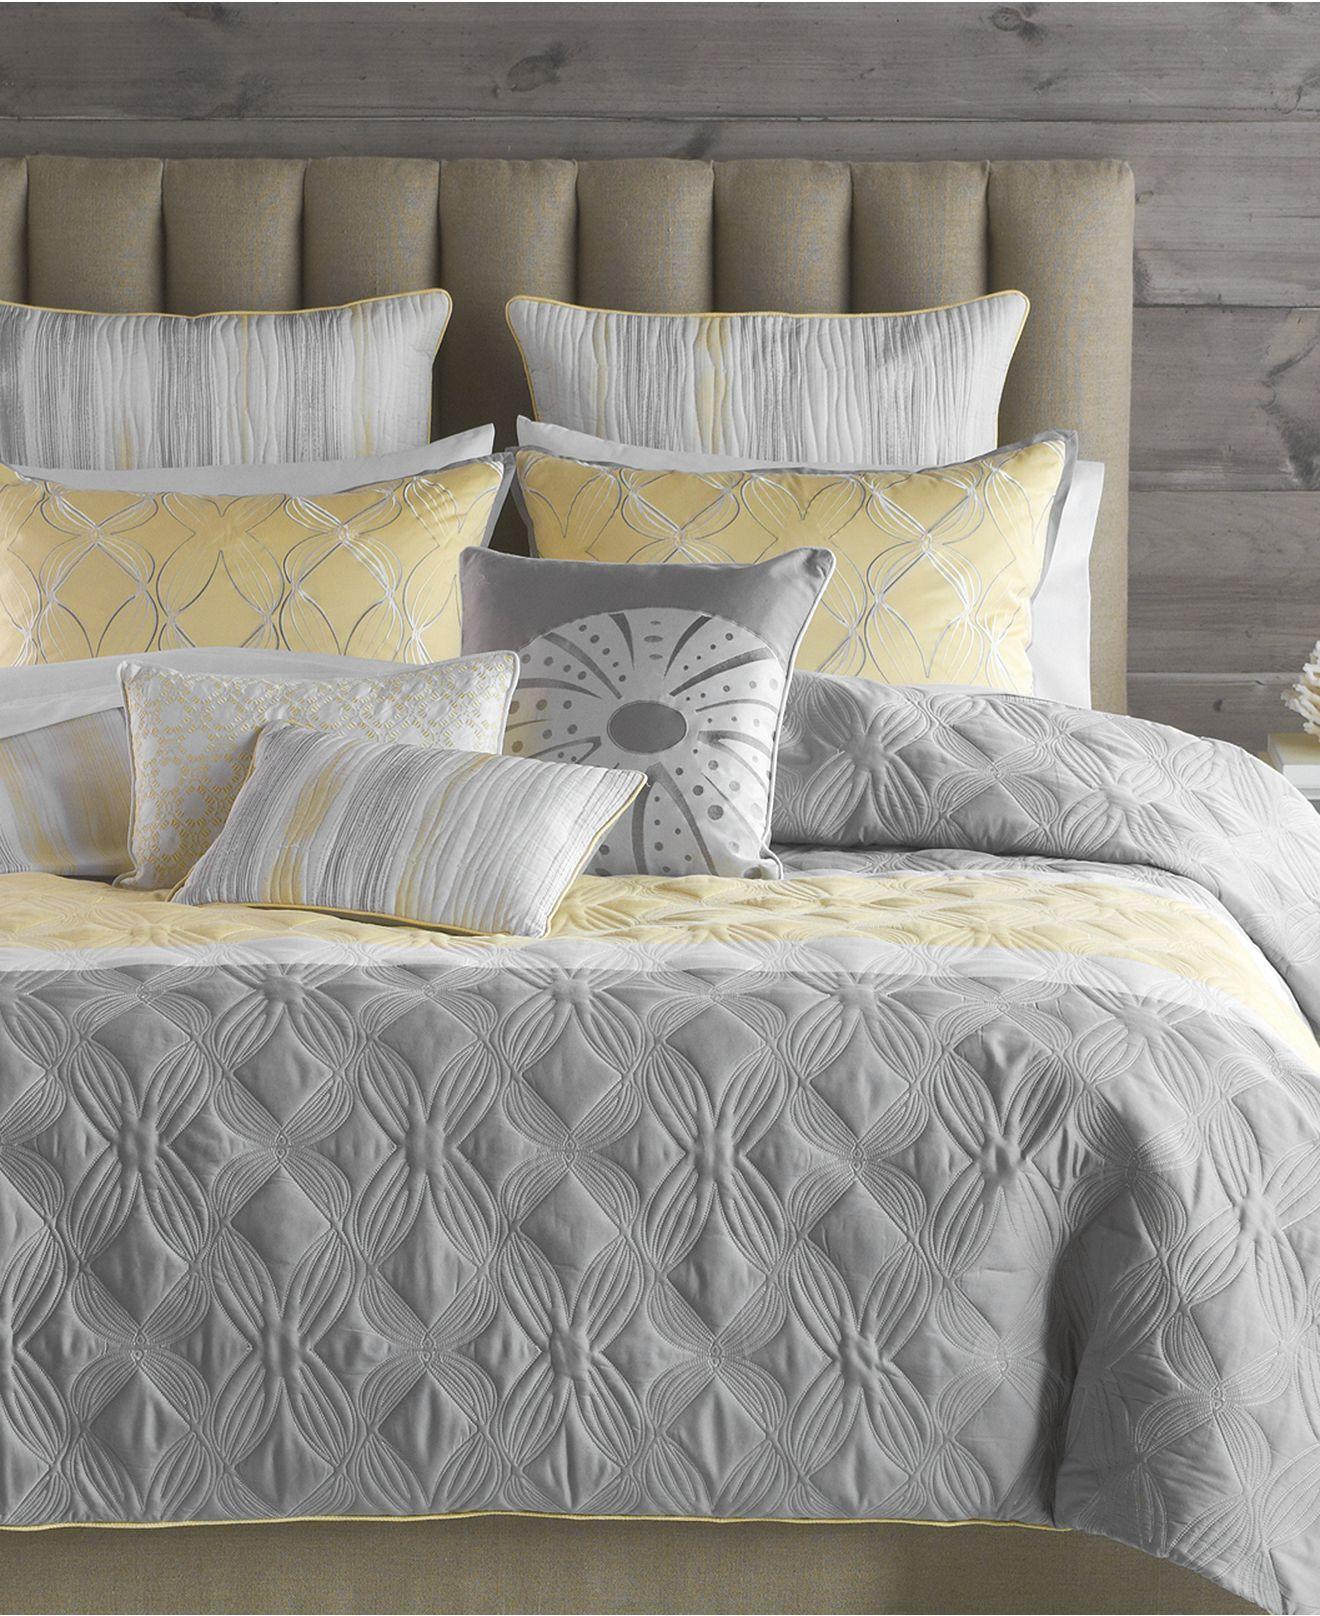 Bryan Keith Bedding Tango 9 Piece California King Comforter Set